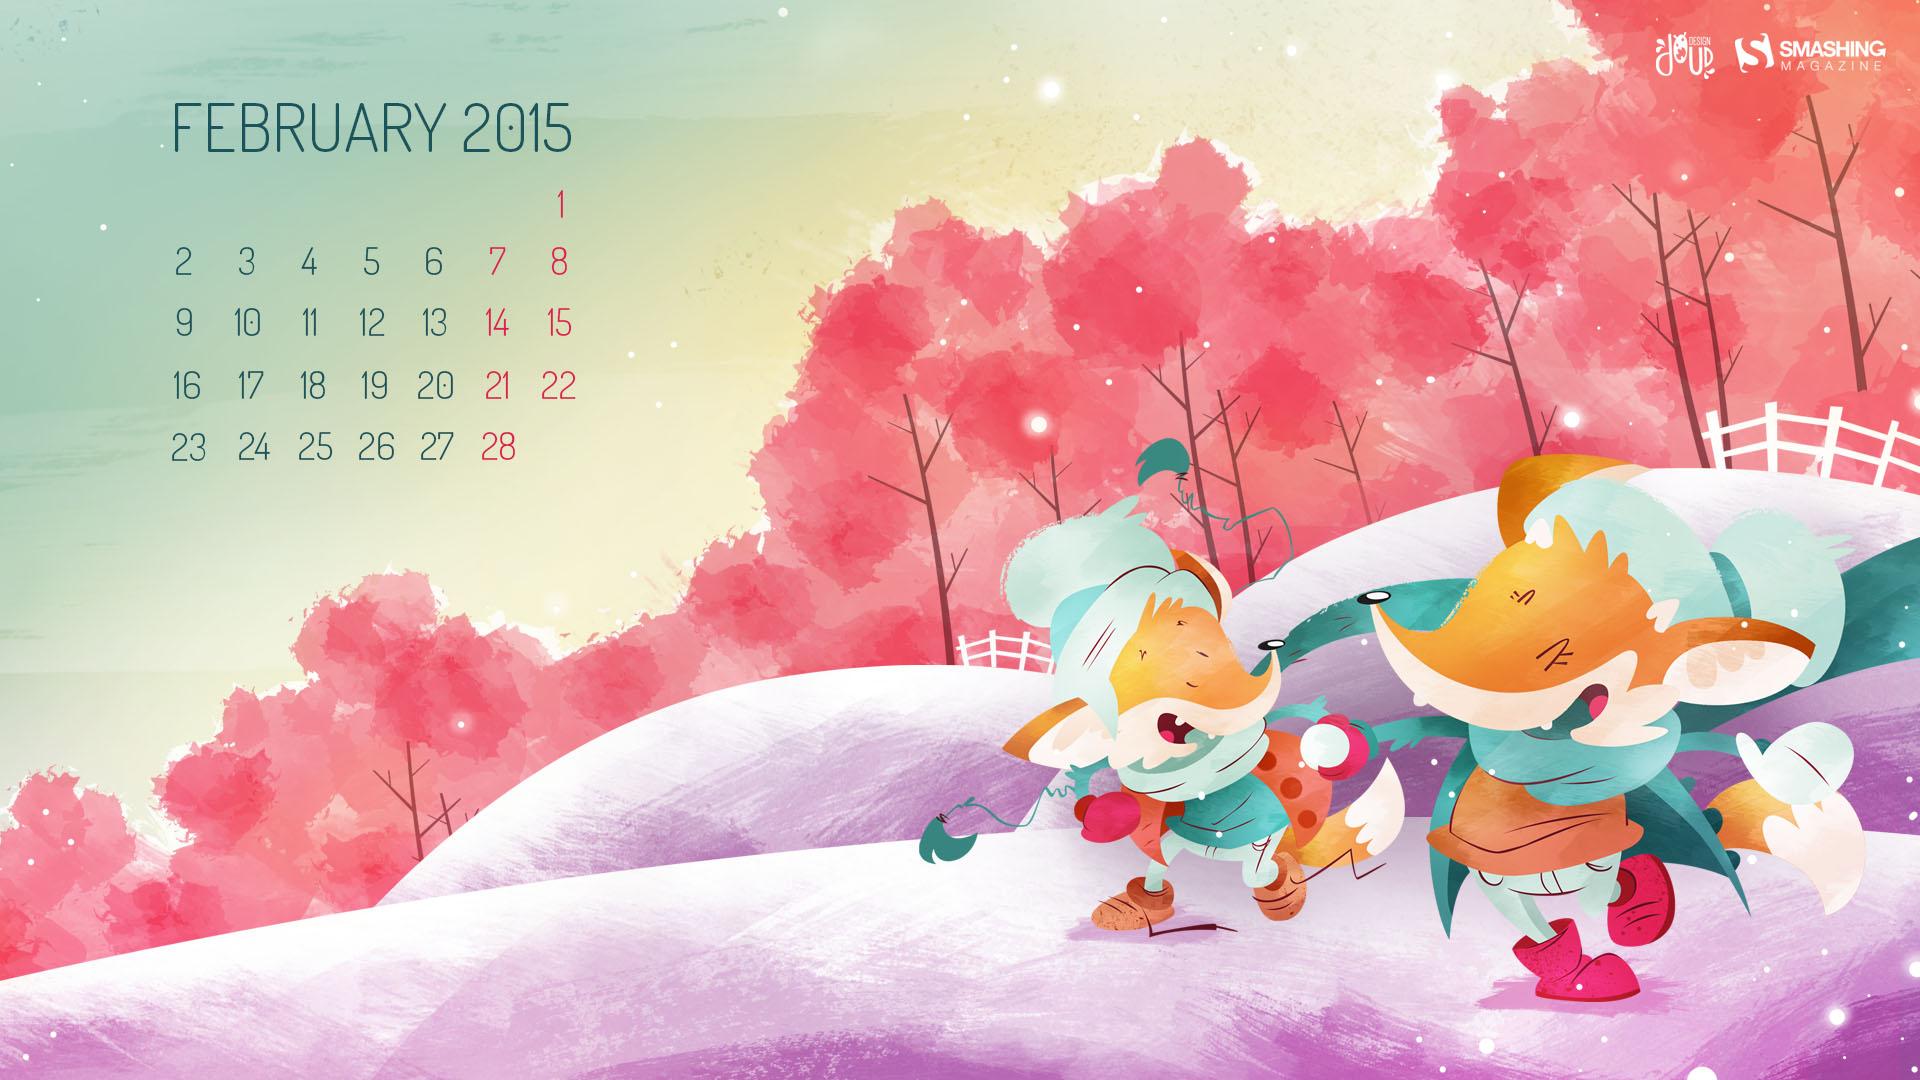 Desktop Wallpaper Calendars February 2015 Smashing Magazine 1920x1080